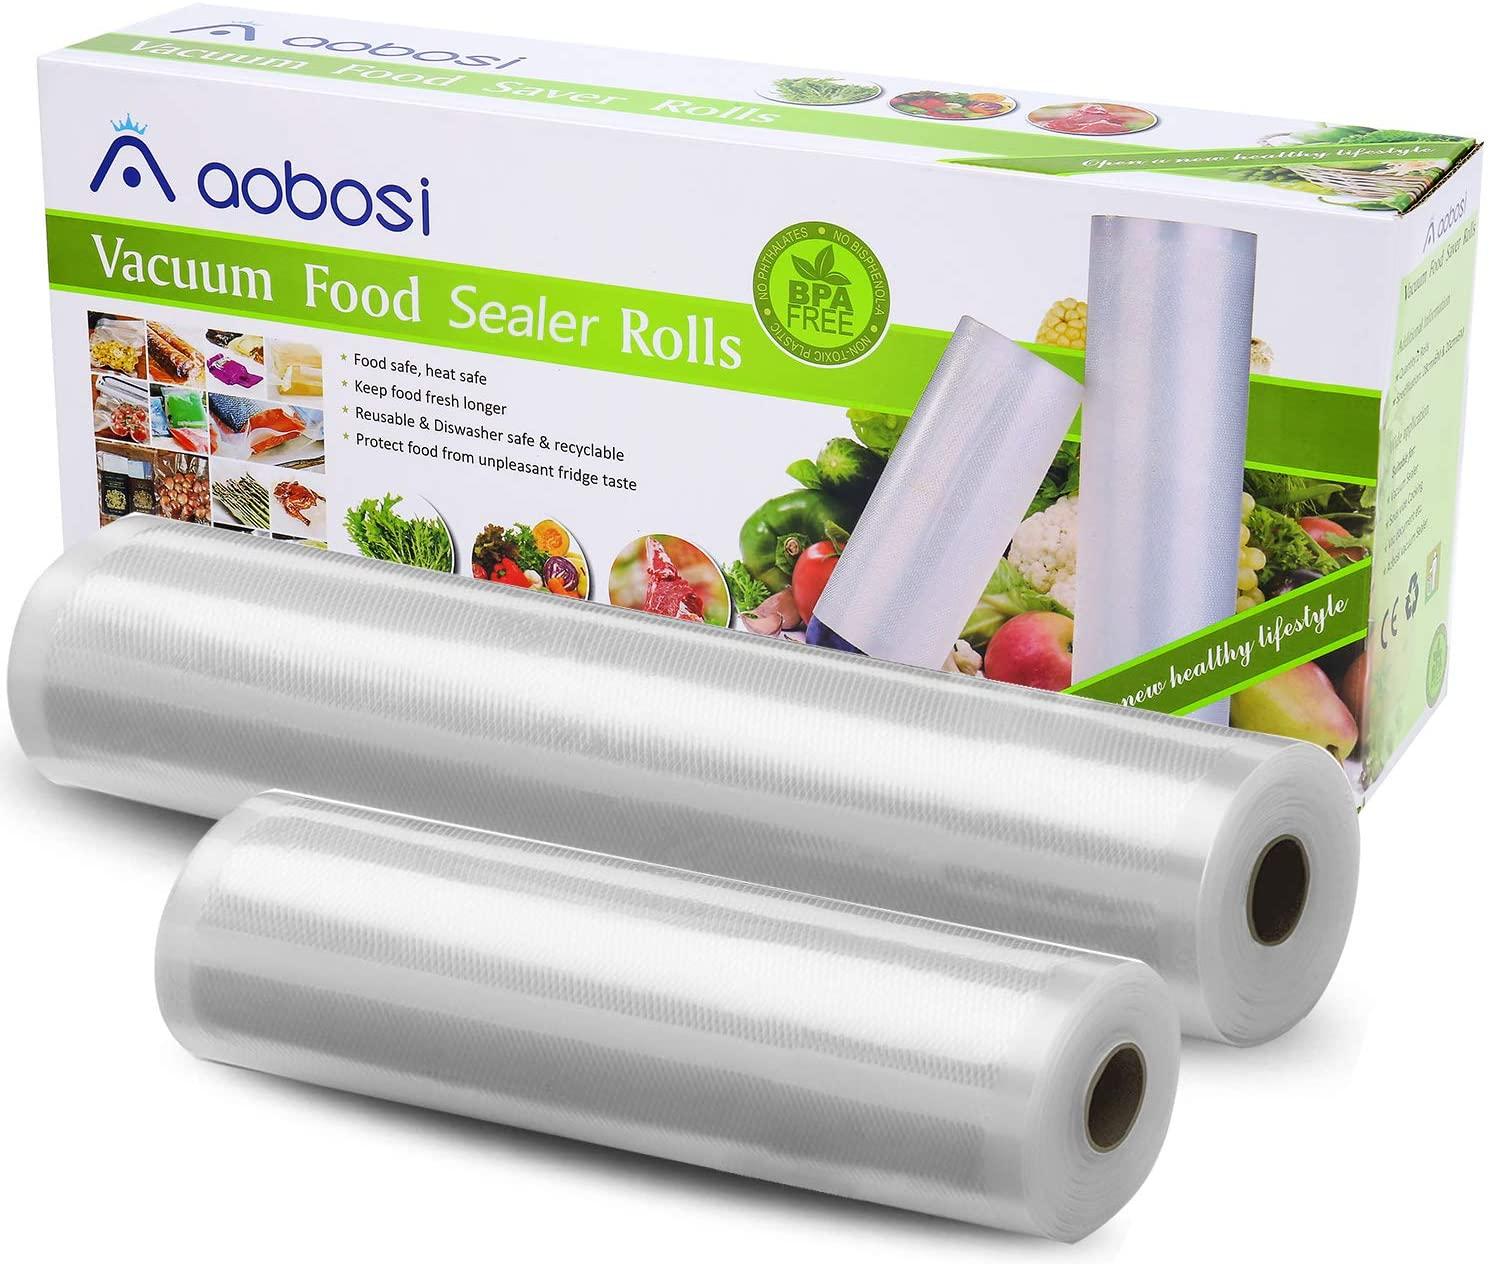 Aobosi Recyclable Vacuum Sealer Bags Vacuum Food Sealer 2 Pack Roll 20cmX6m and 28cmX6m - £9.59 (+£4.49 NP) @ Sold by Sibake EU and FBA